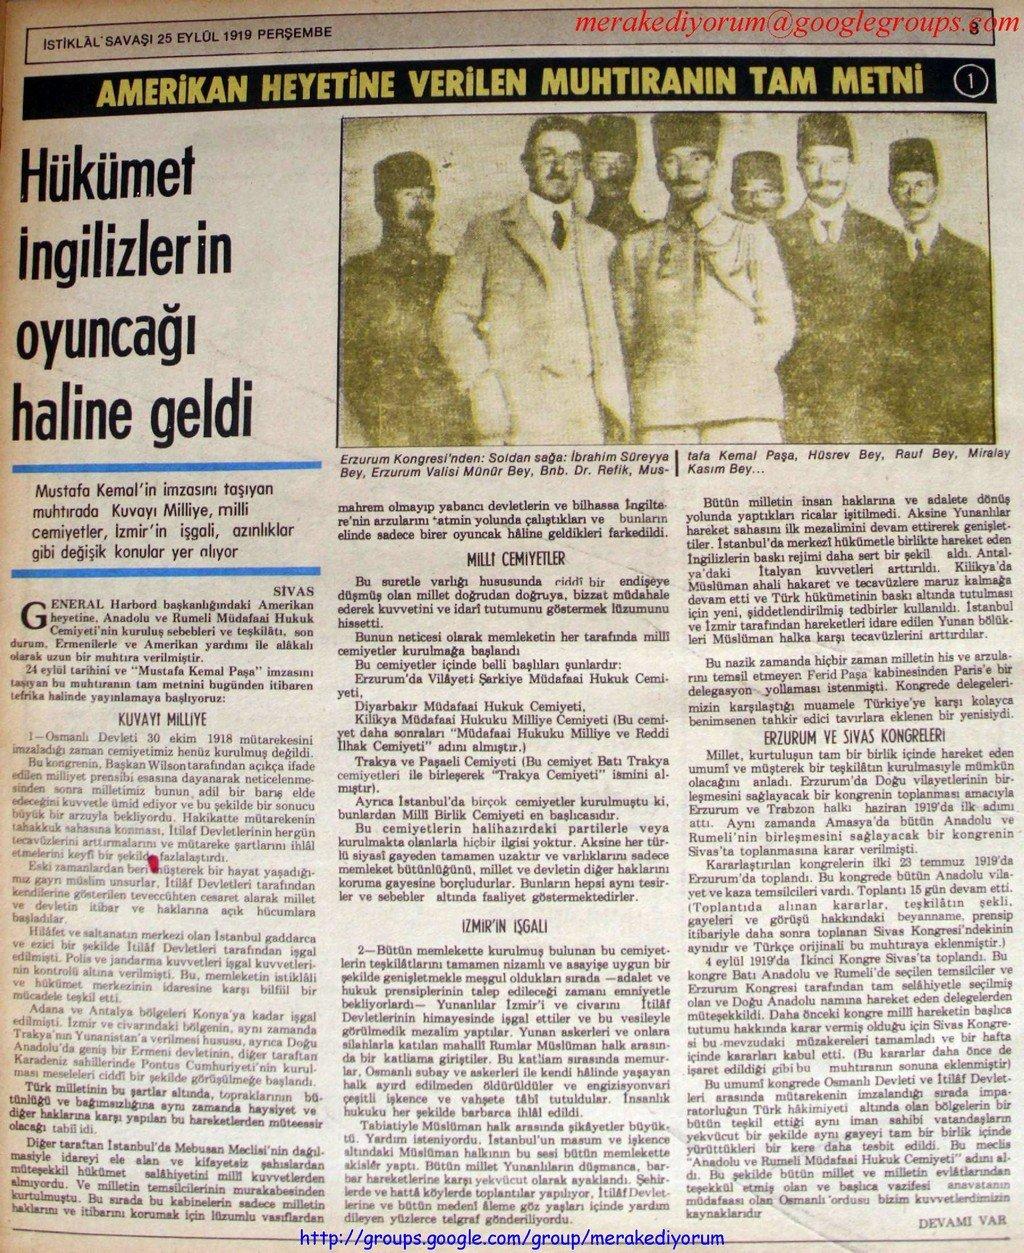 istiklal savaşı gazetesi - 25 eylül 1919